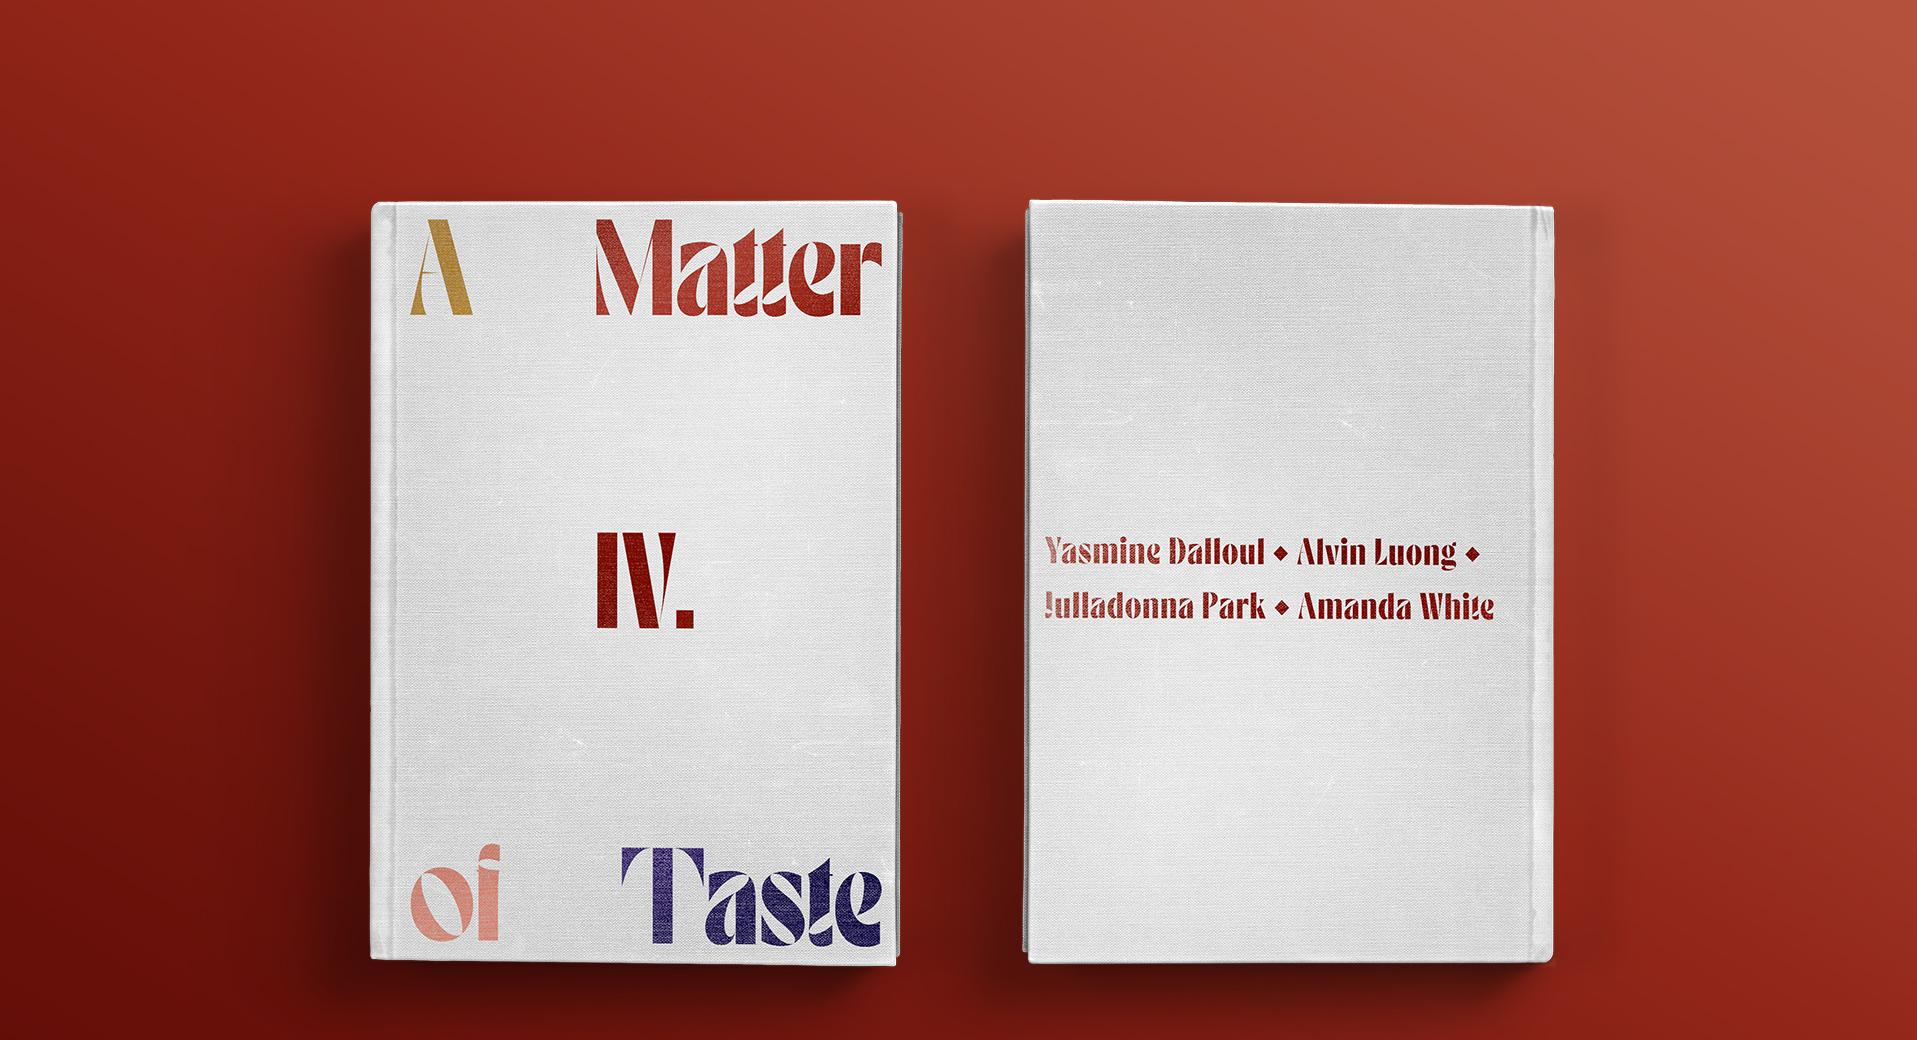 A Matter of Taste Chapter Four: Yasmine Dalloul, Alvin Luong, Julladonna Park, Amanda White